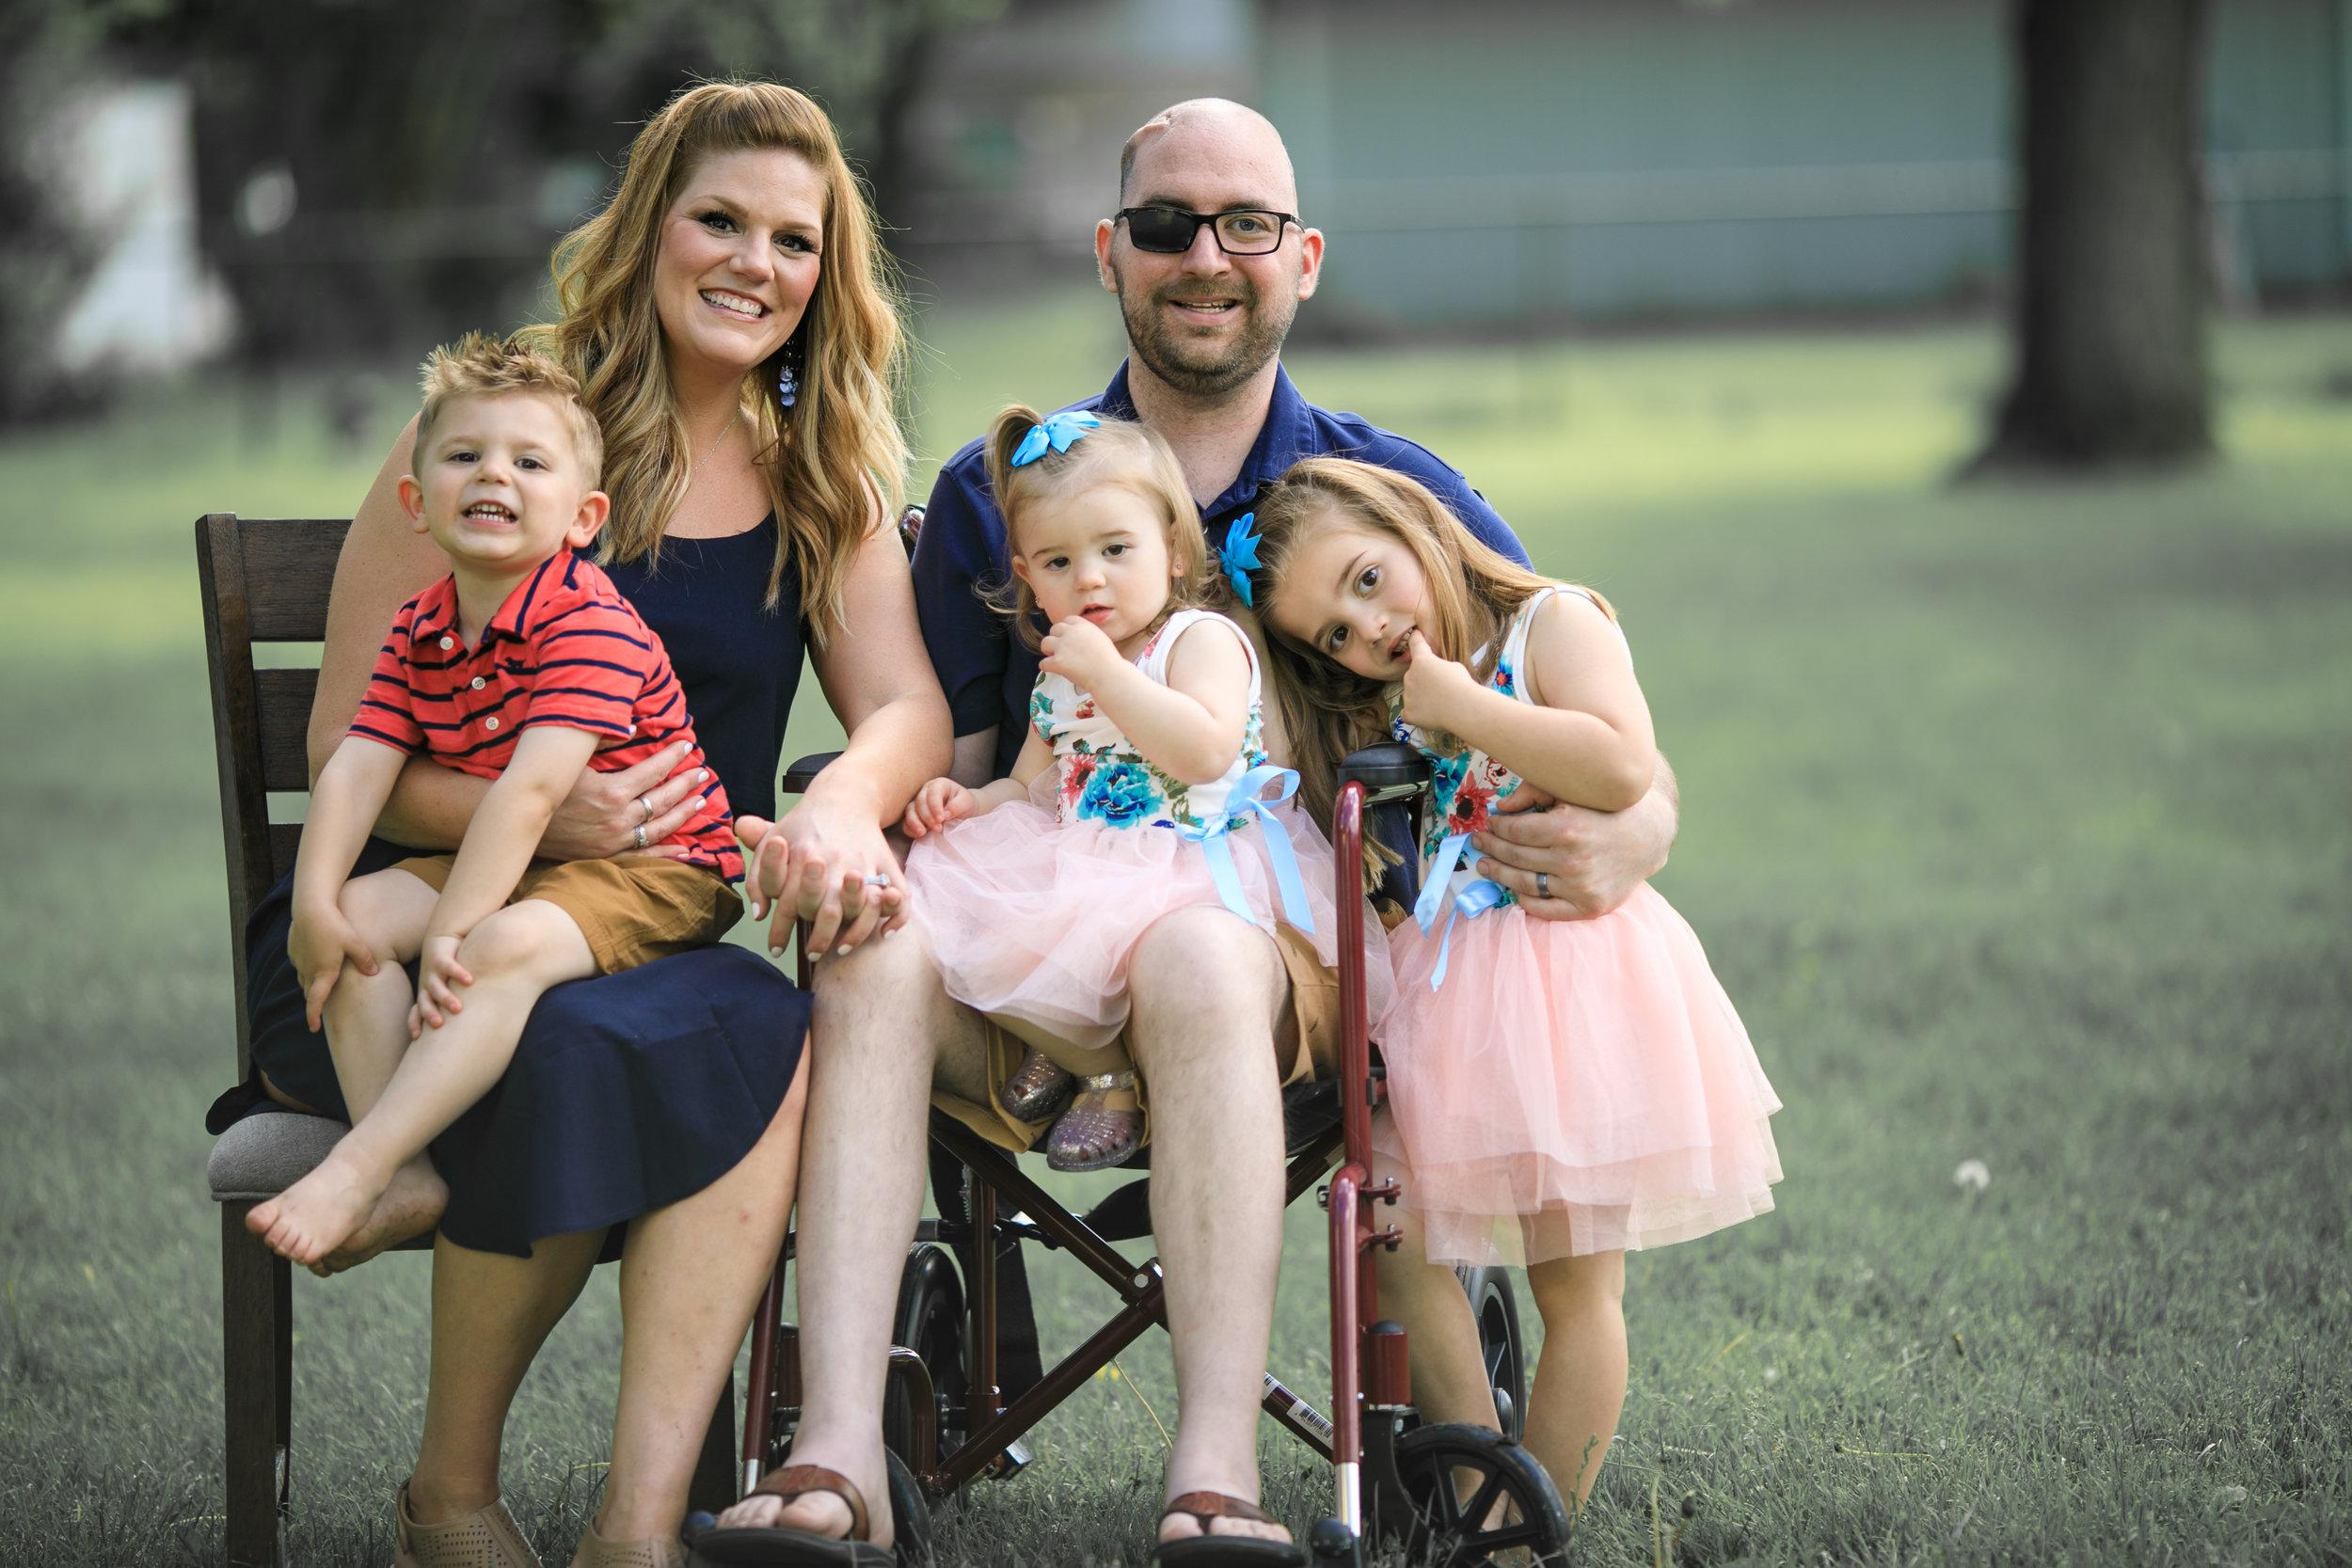 Lisa-and-Dan-coghlan-terminally-ill-photographs-brain-cancer14.jpg